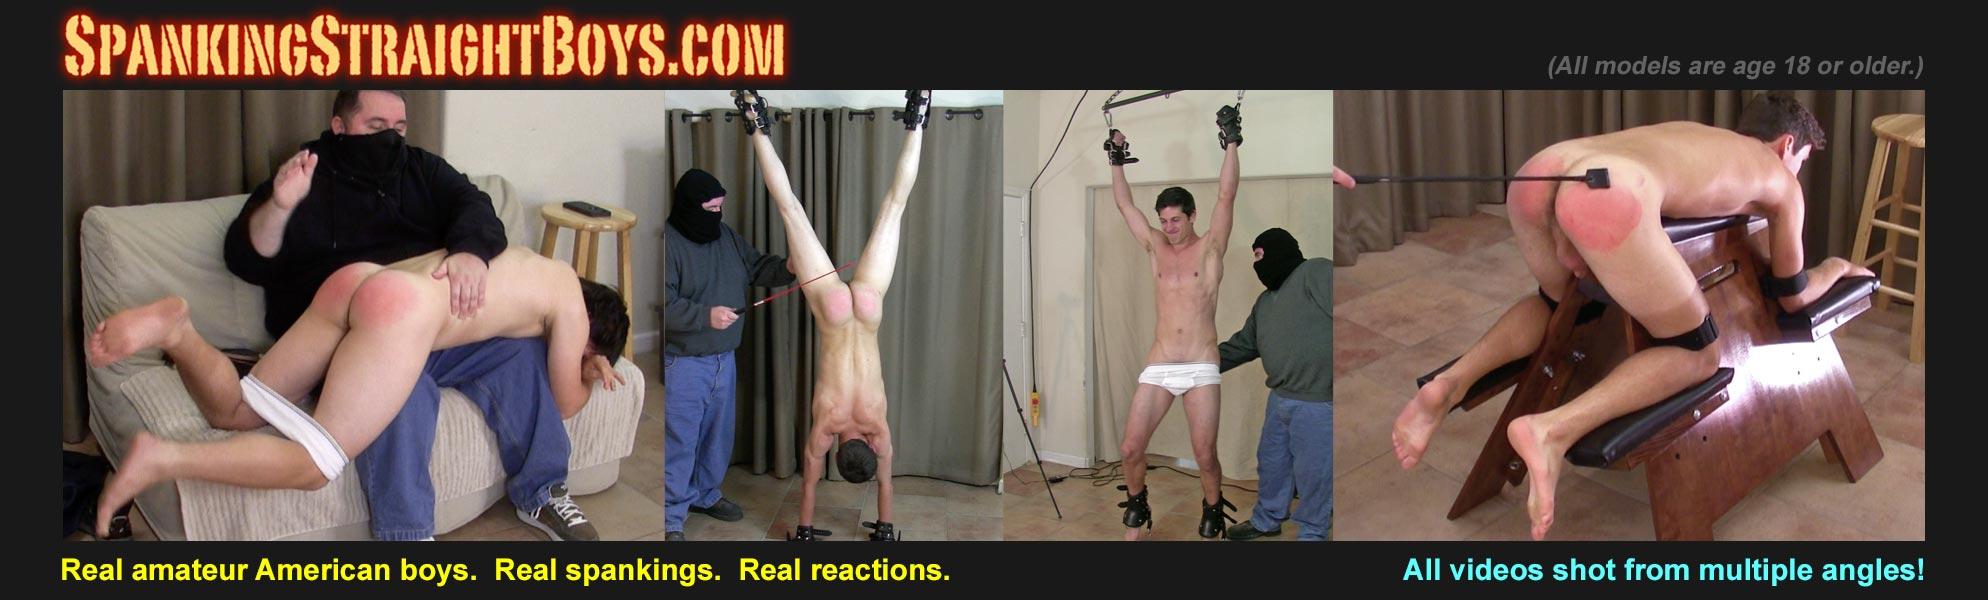 gay bondage spanking videos